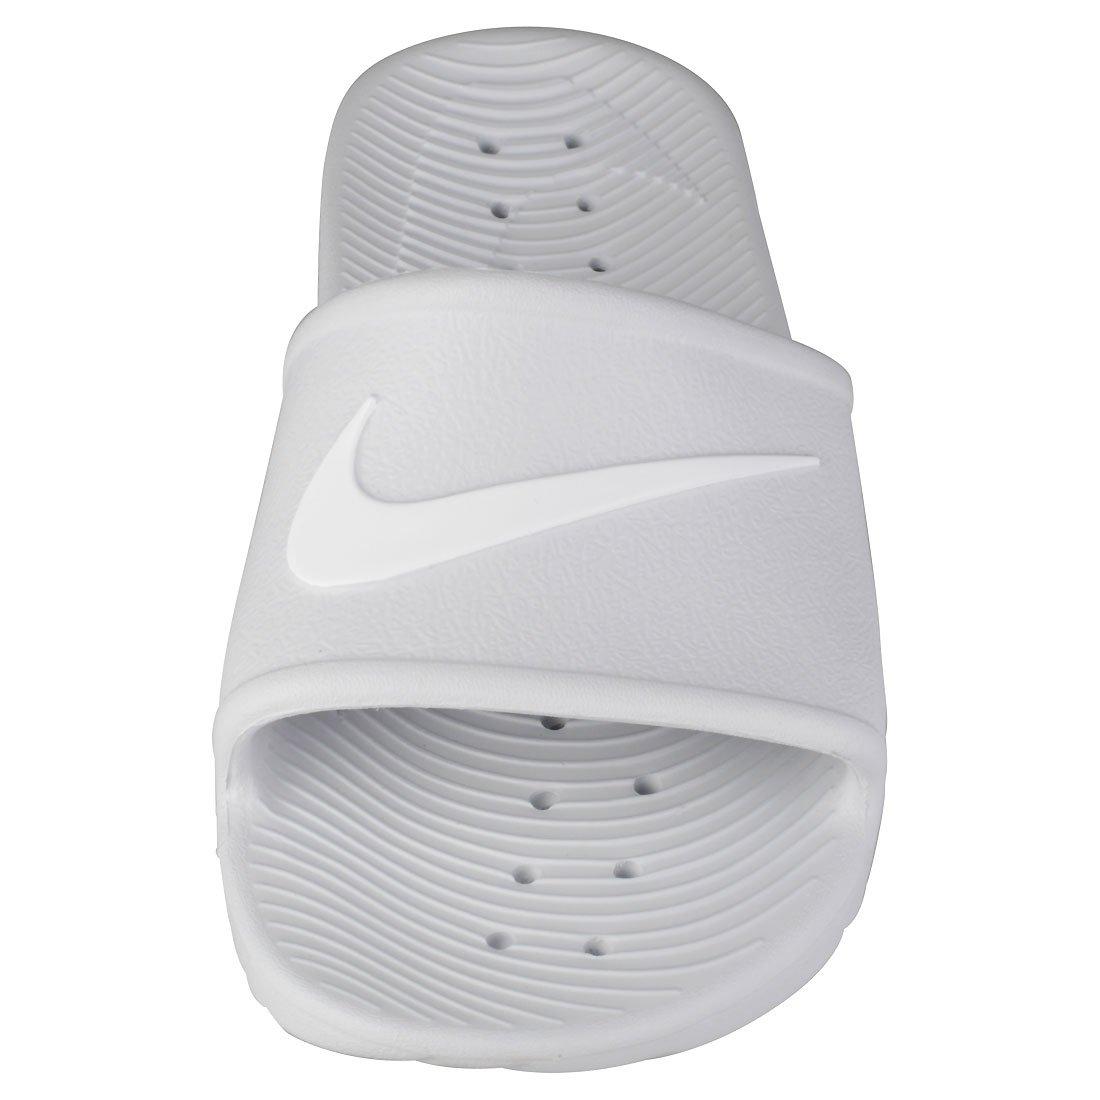 NIKE Women's Kawa Shower Slide Sandals B06WGQSPXR 5 B(M) US Pure Platinum/White